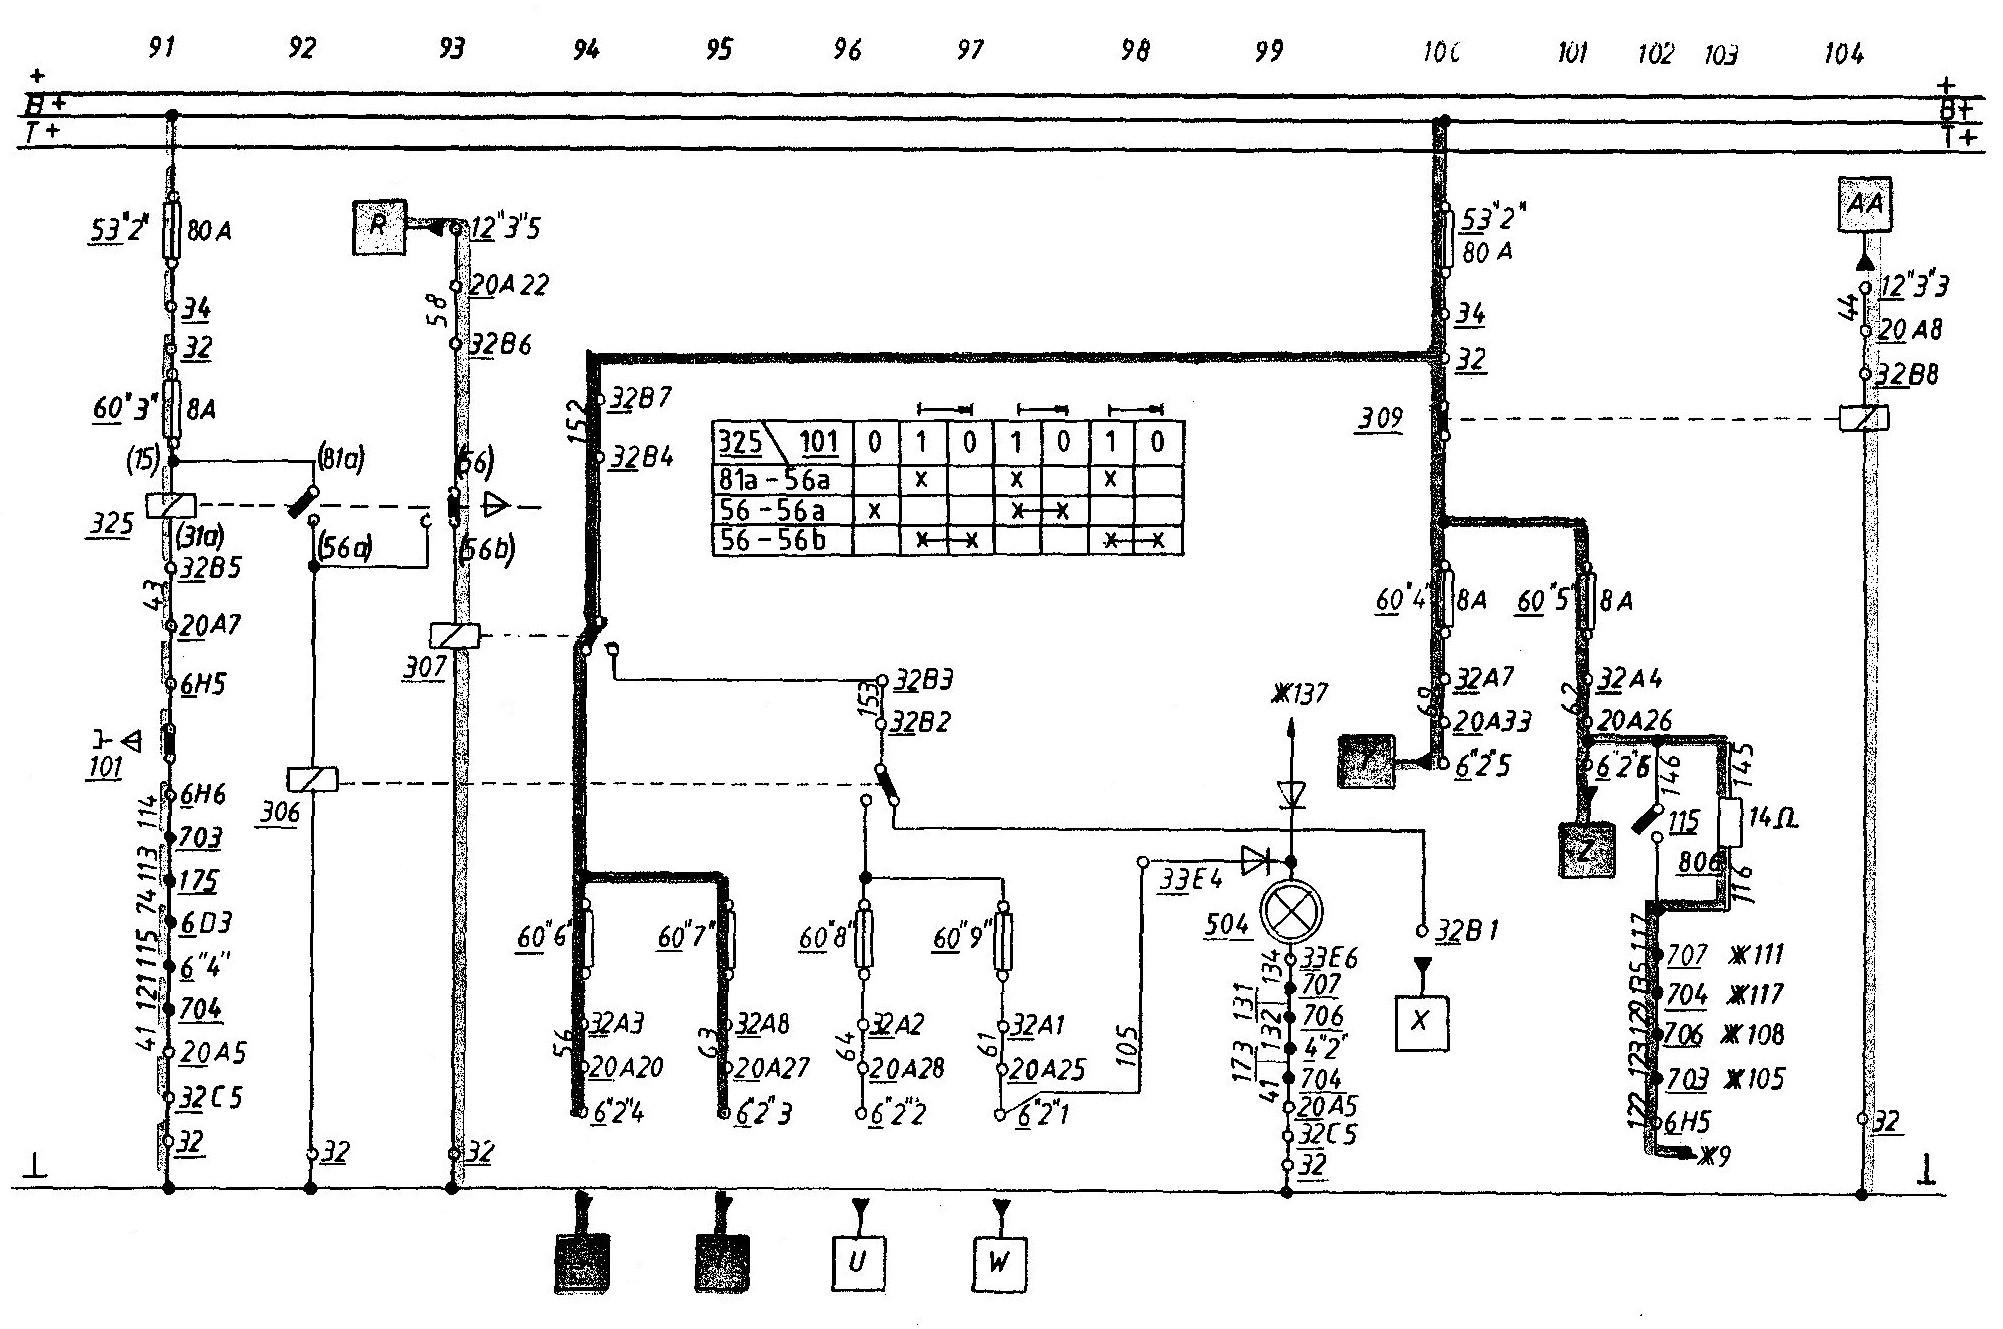 Cat 3406E Wiring Diagram from schematron.org